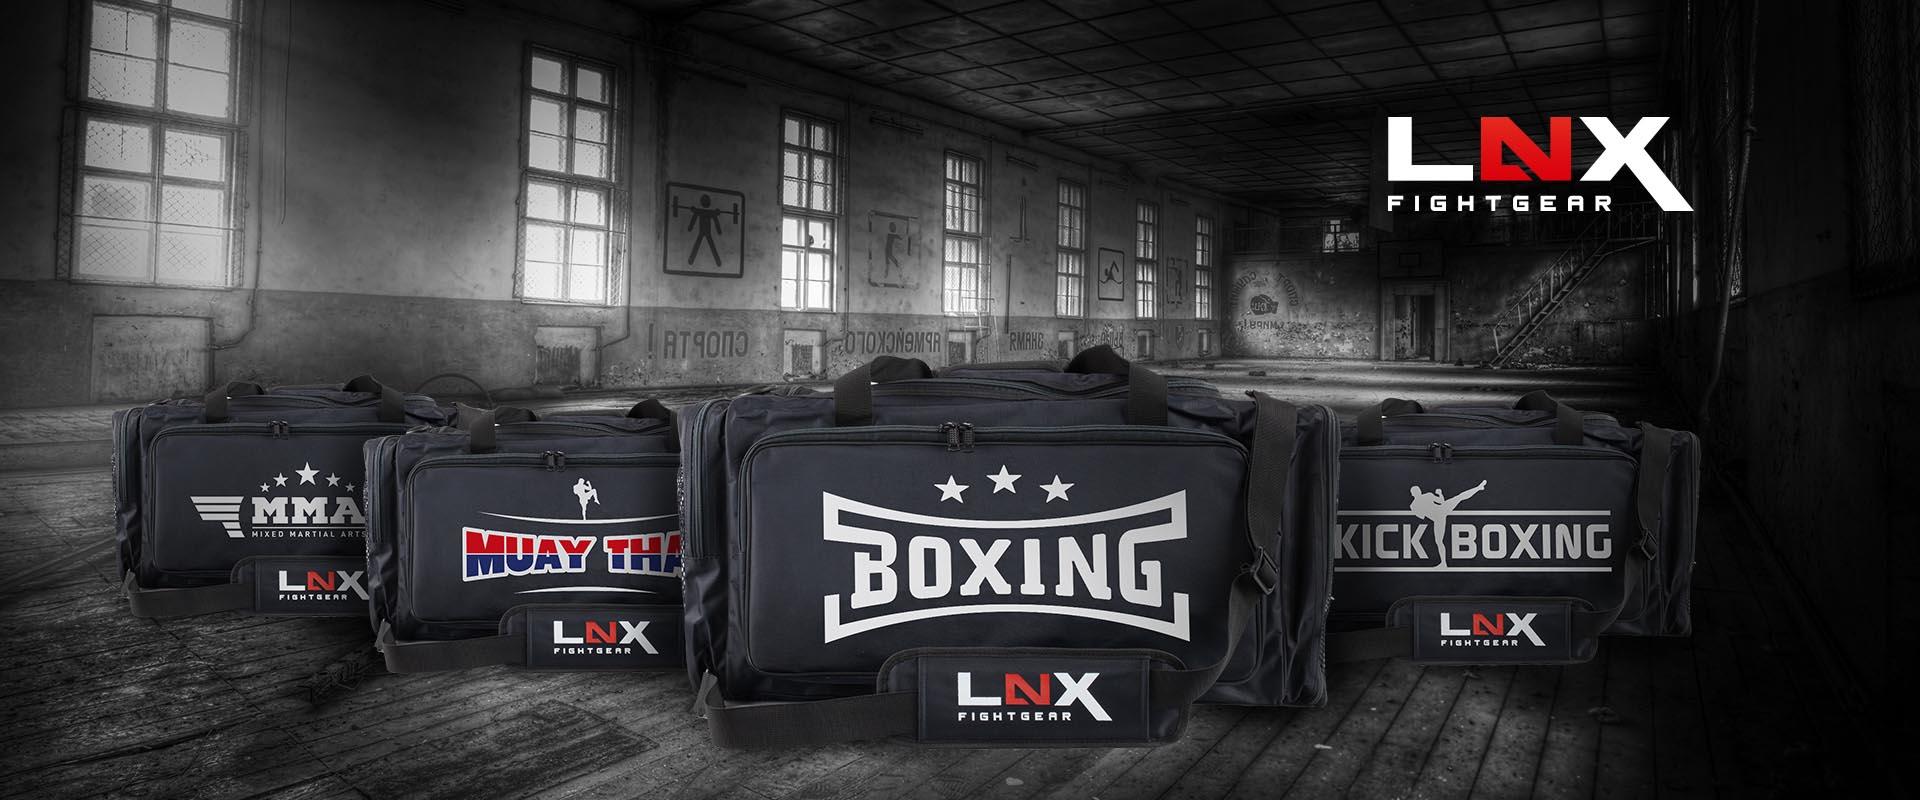 LNX Fightgear Taschen